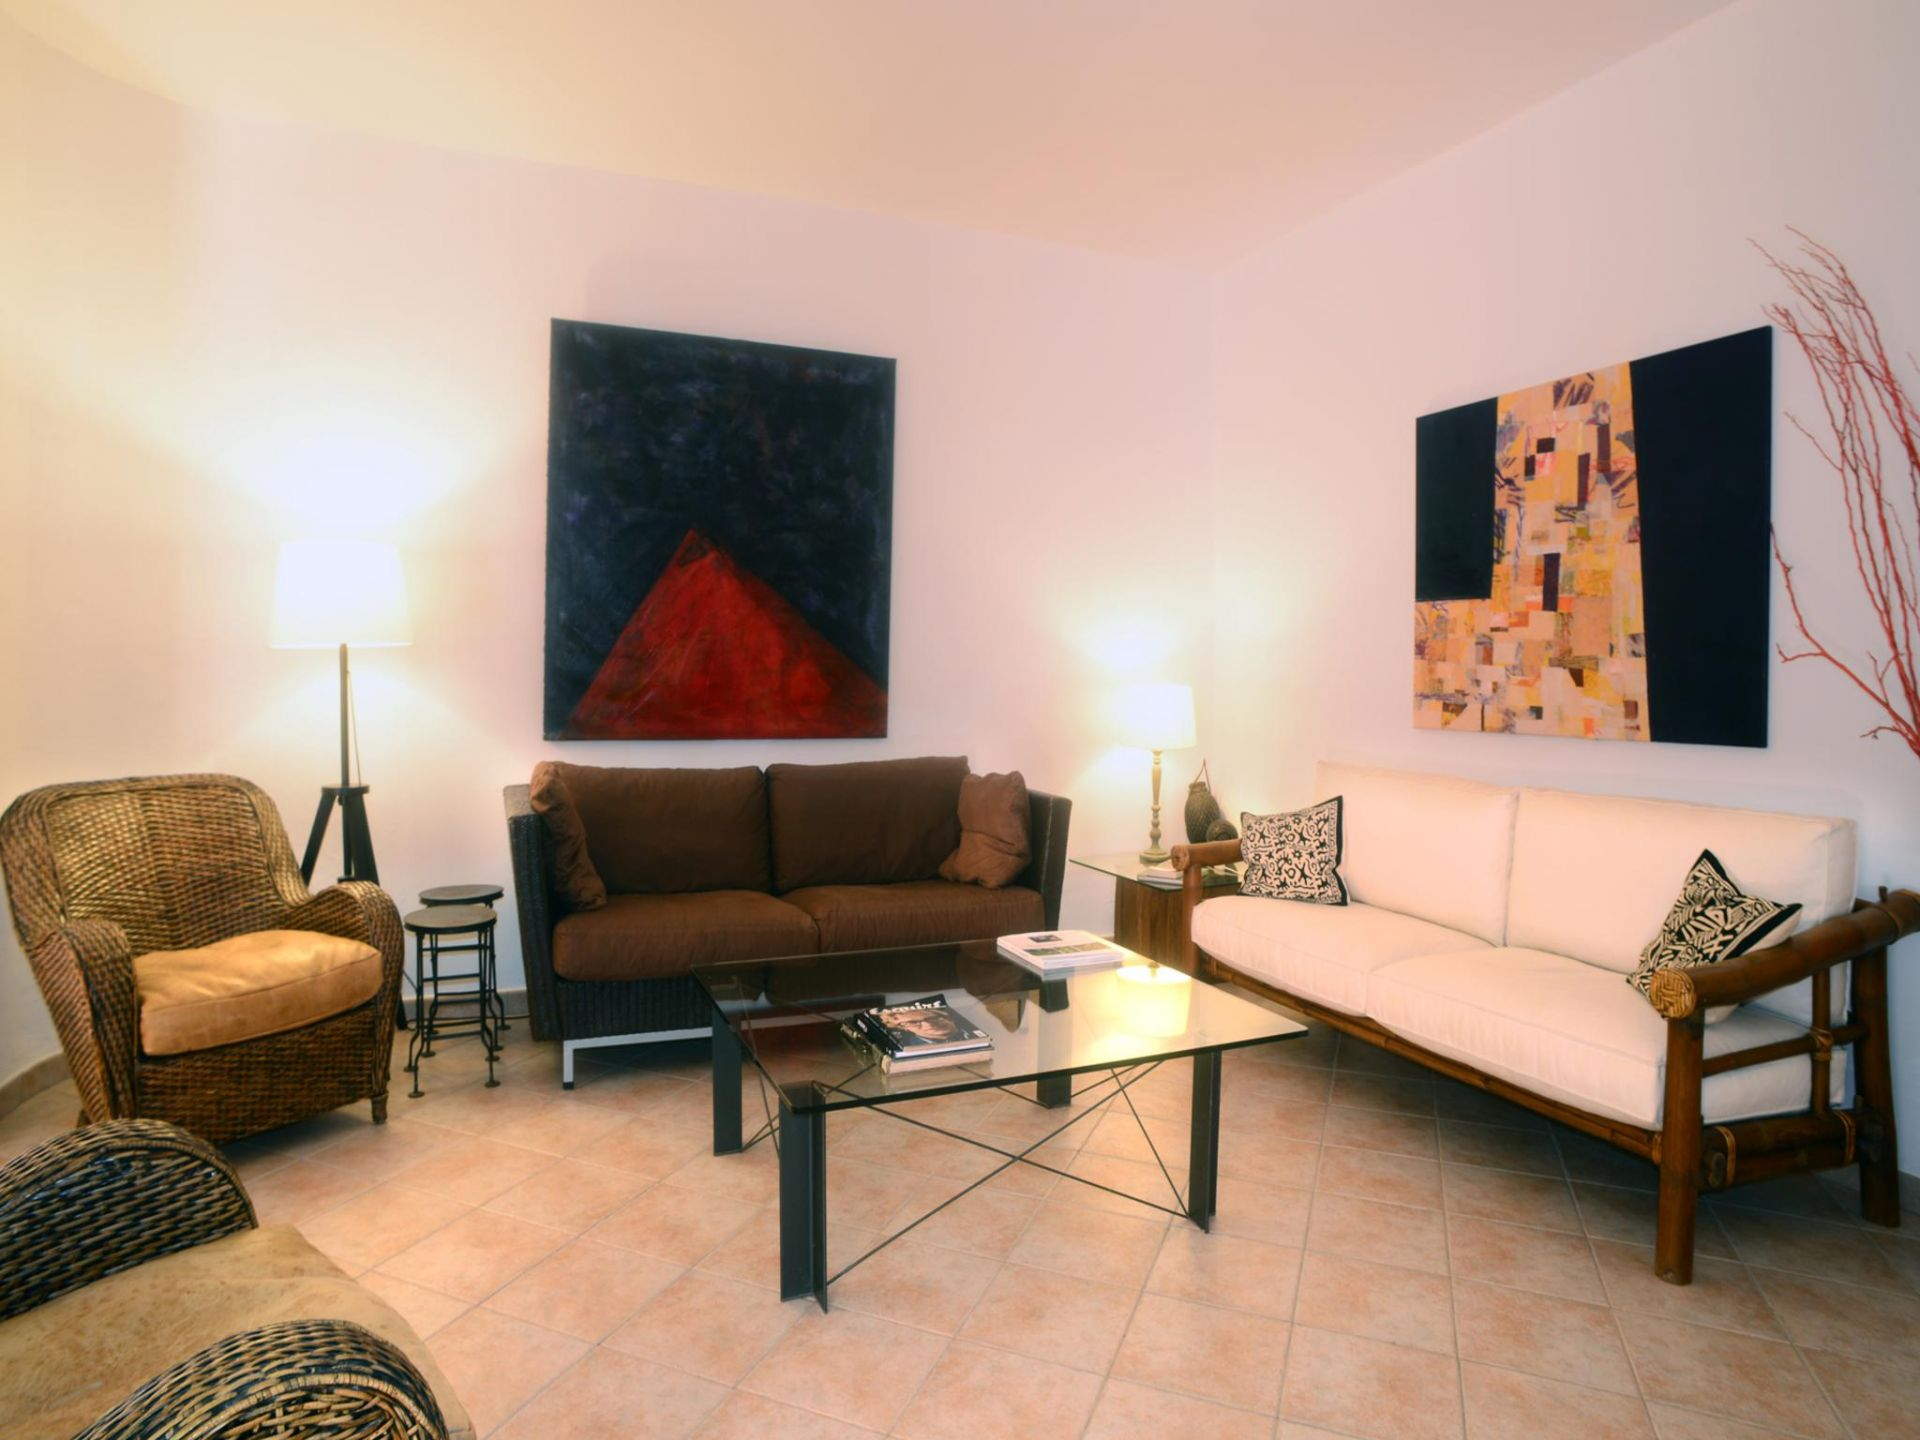 Holiday apartment Villa San Agustin 10 - Holiday Rental (854295), Maspalomas, Gran Canaria, Canary Islands, Spain, picture 30